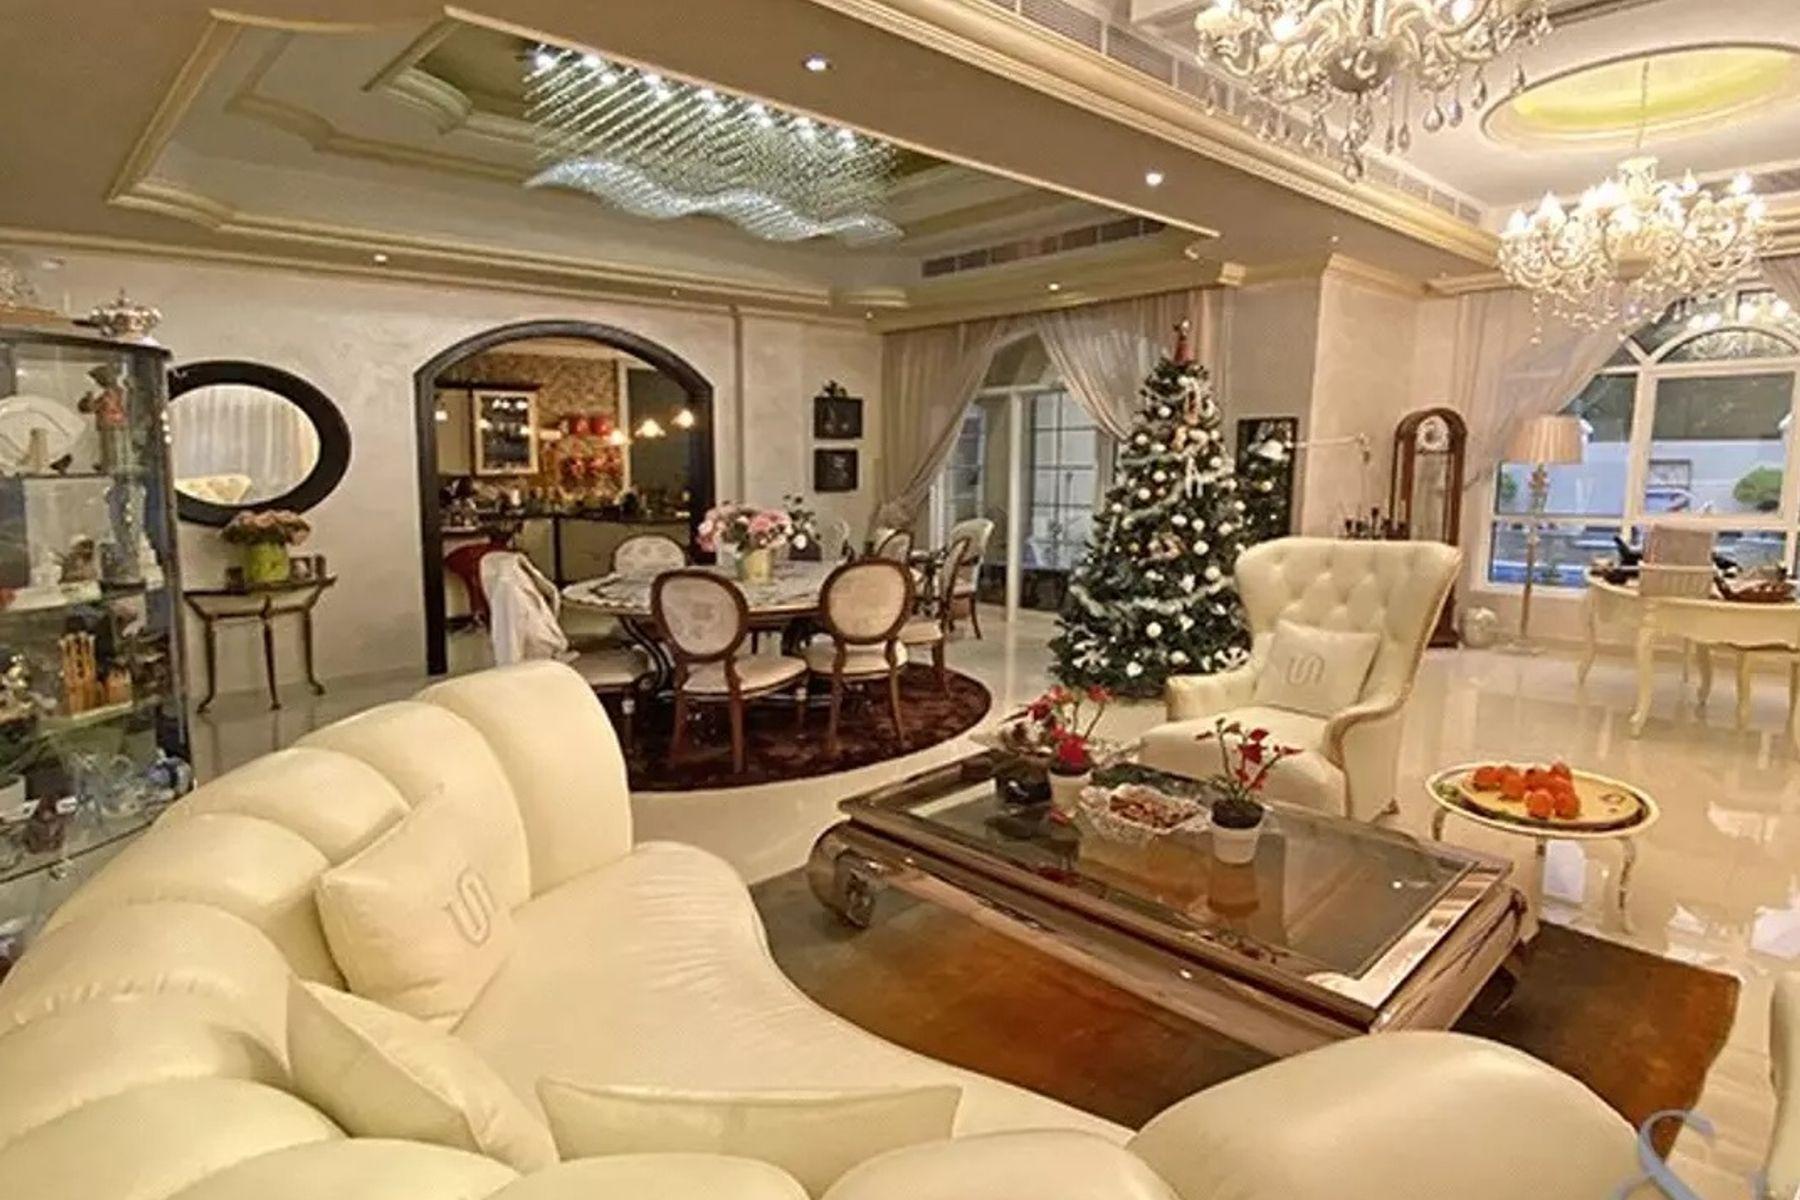 Bespoke 6 Bed Villa | Vacant on Transfer